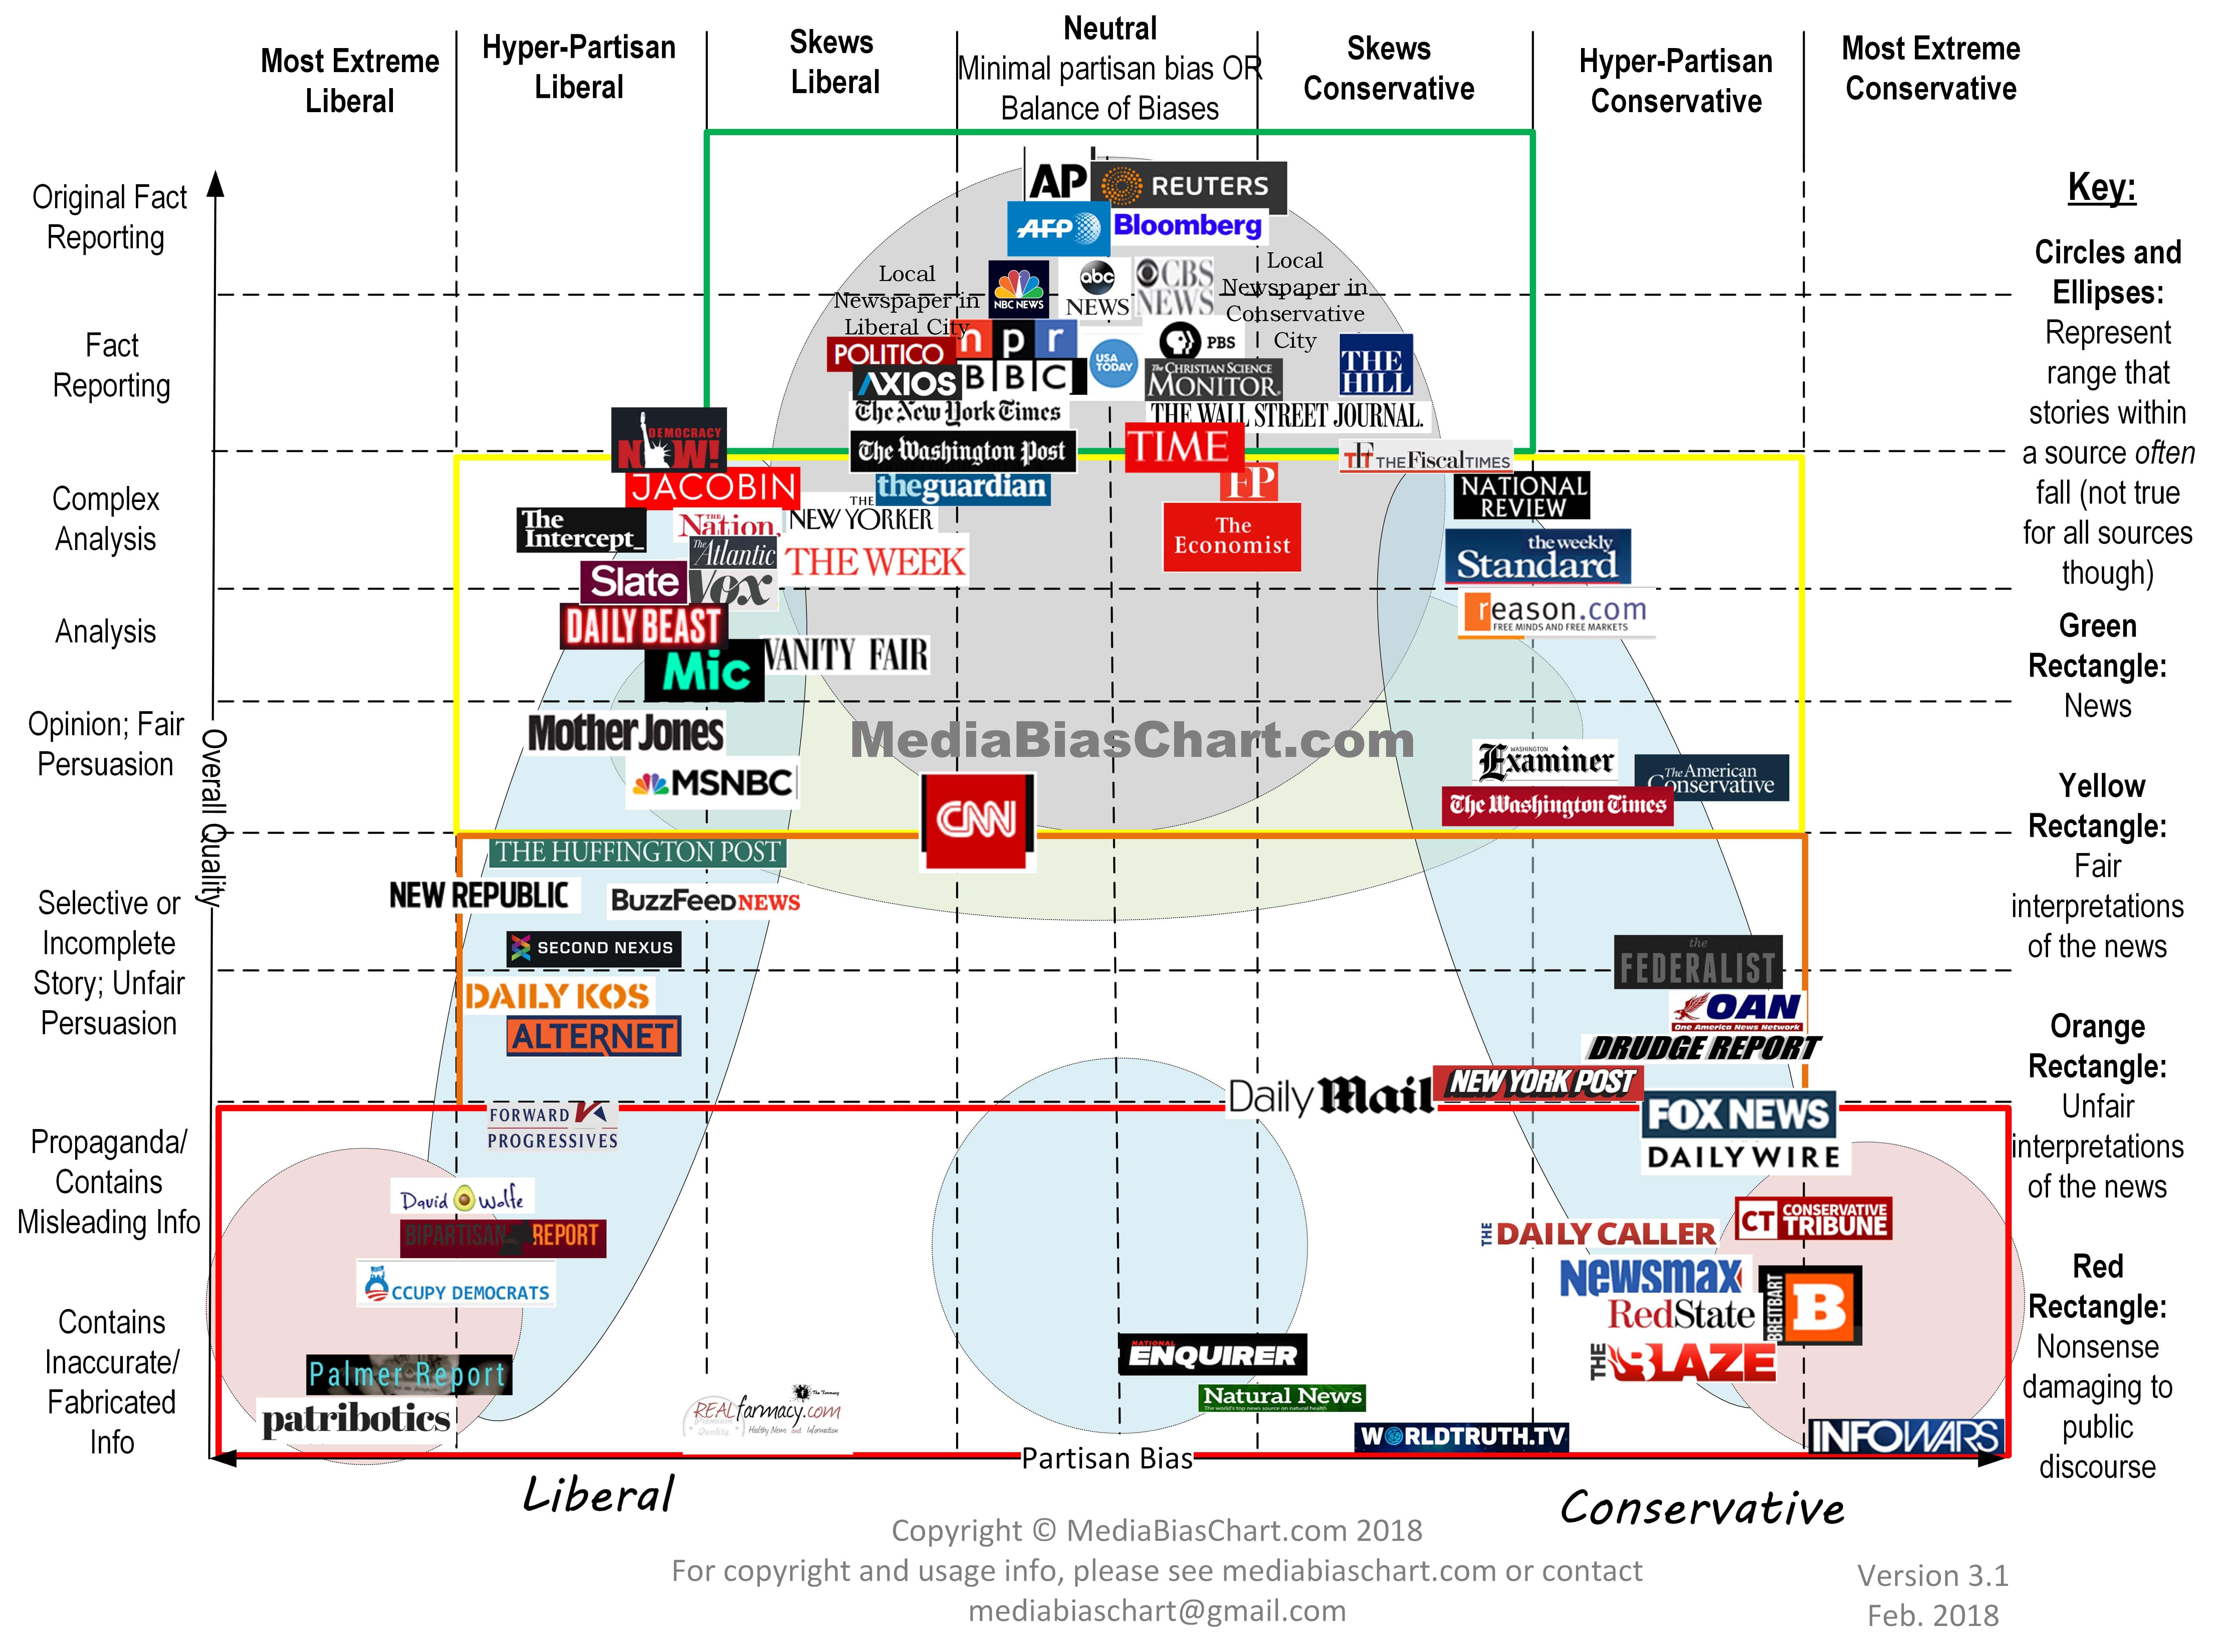 Media Bias Chart 3 1 Minor Updates Based On Constructive Feedback